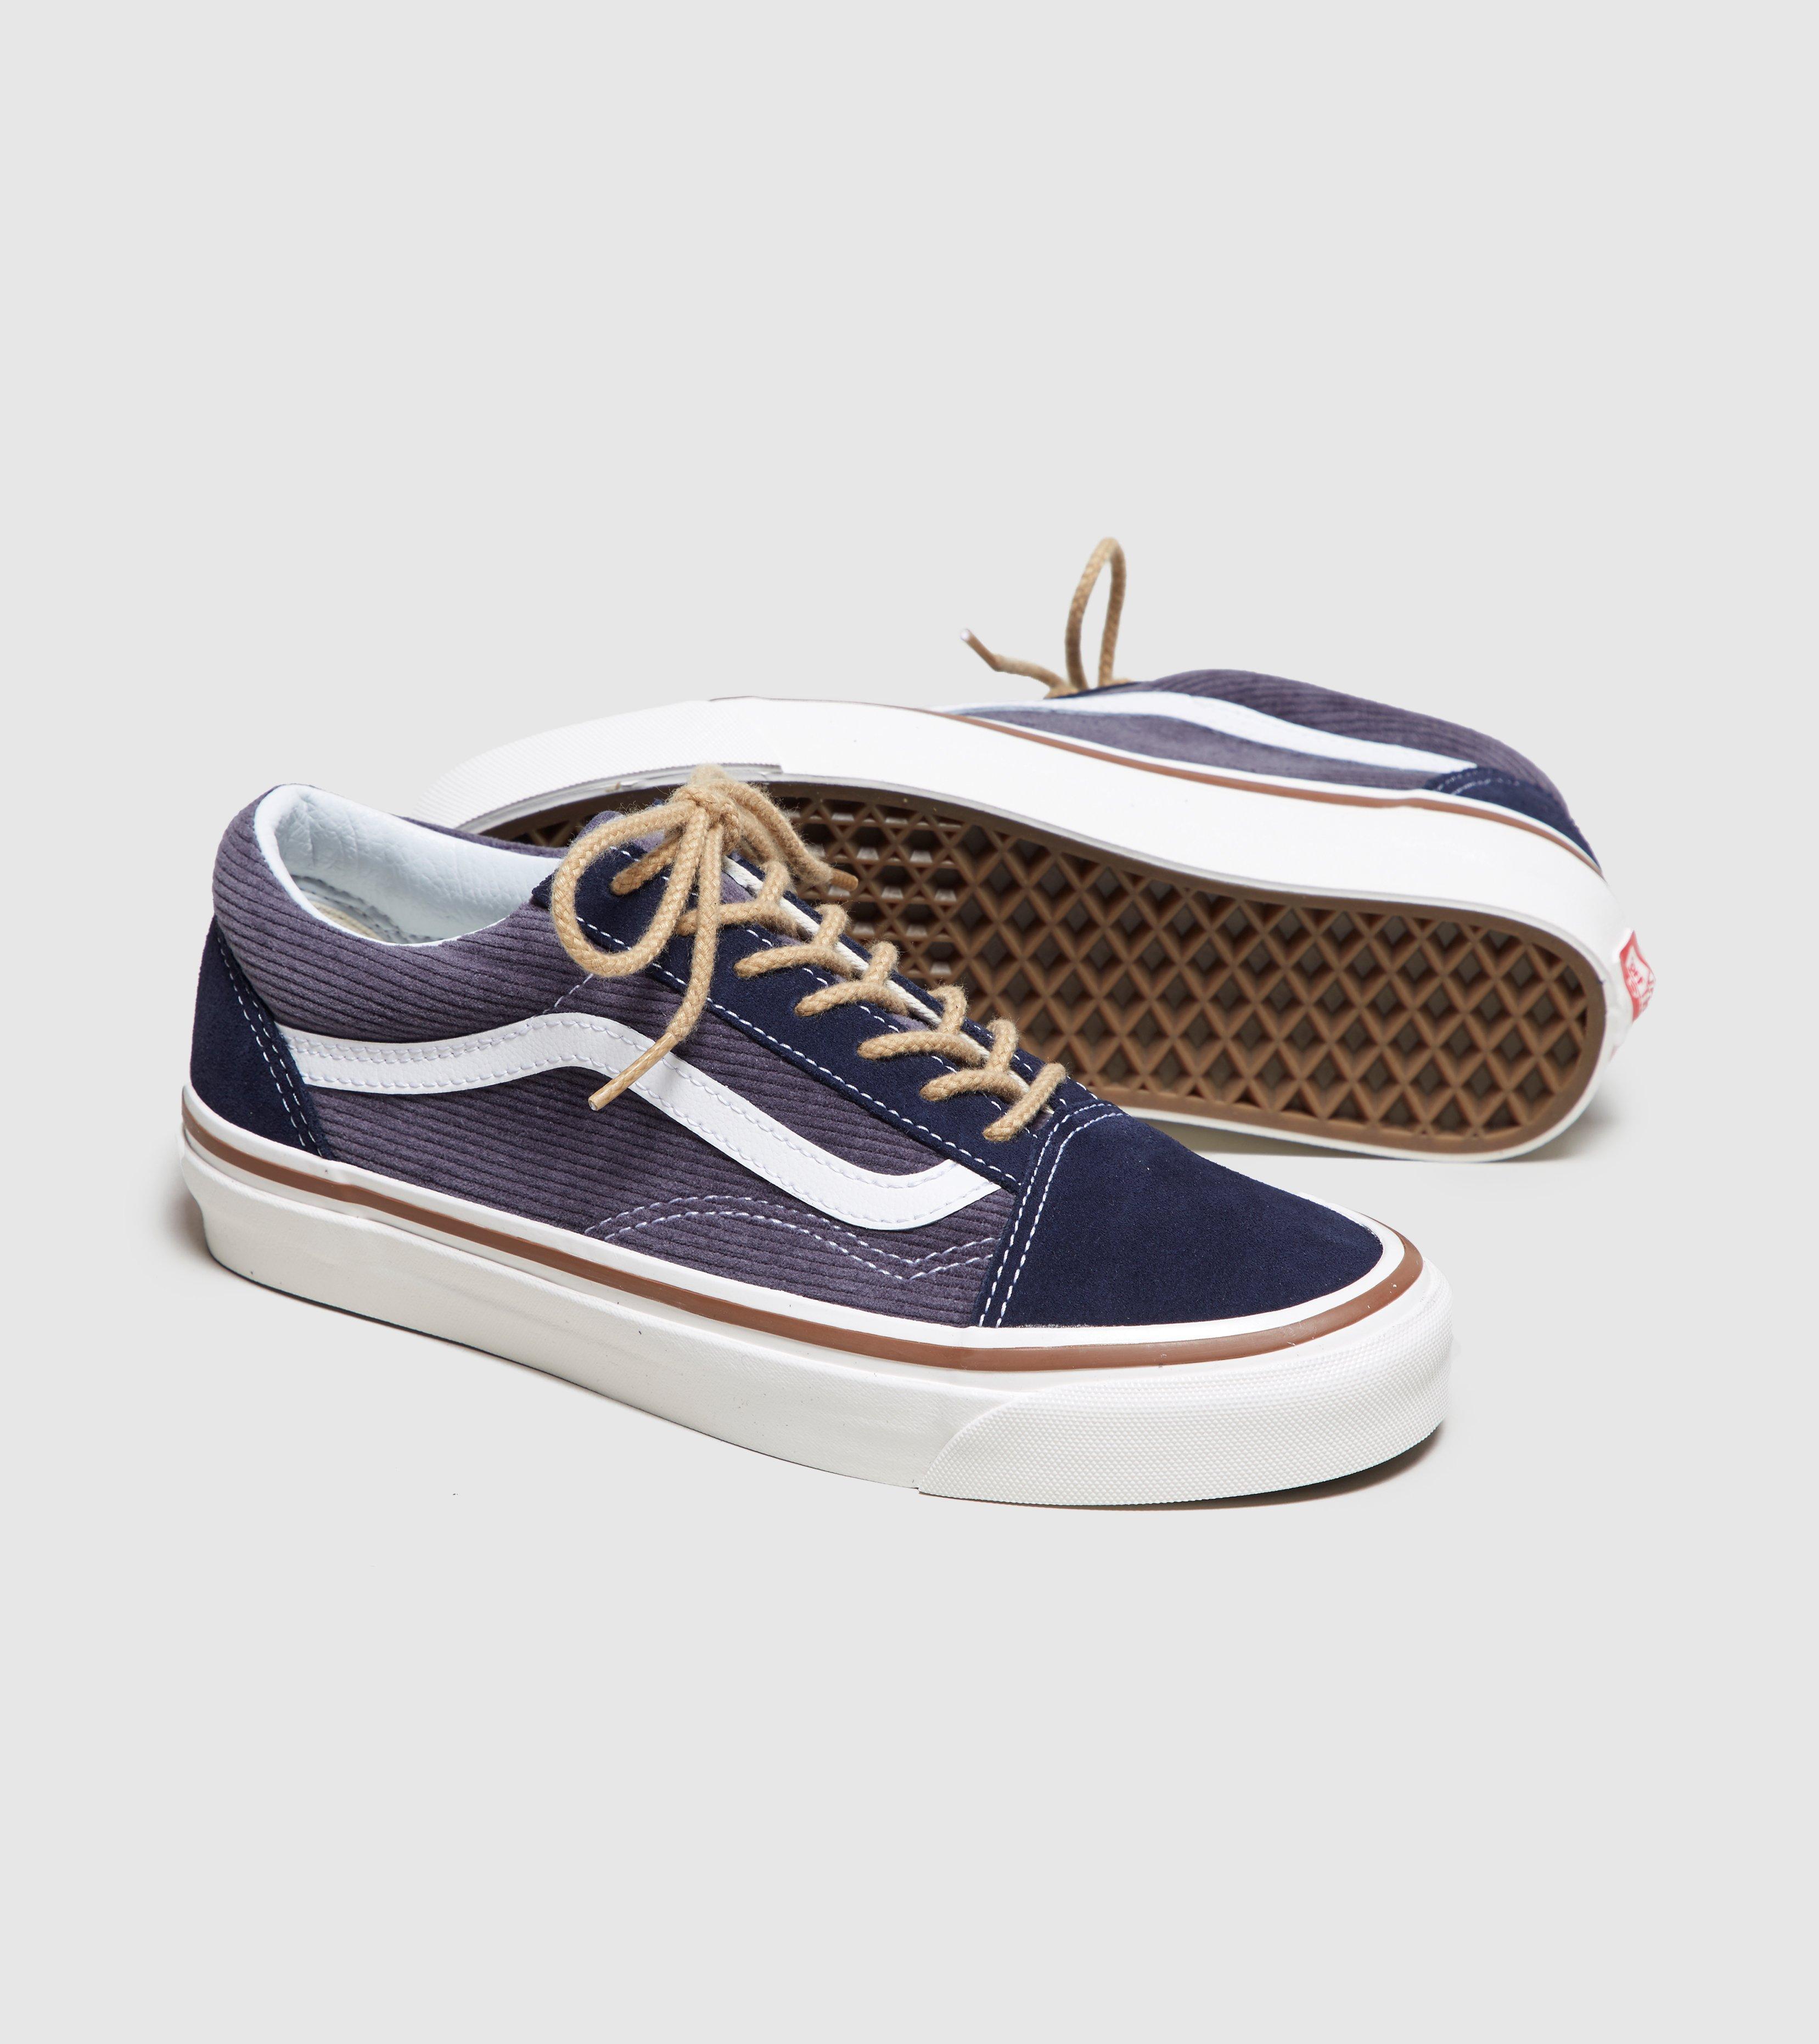 Lyst - Vans Anaheim Old Skool 36 Dx Women s in Blue 31fd3b5108